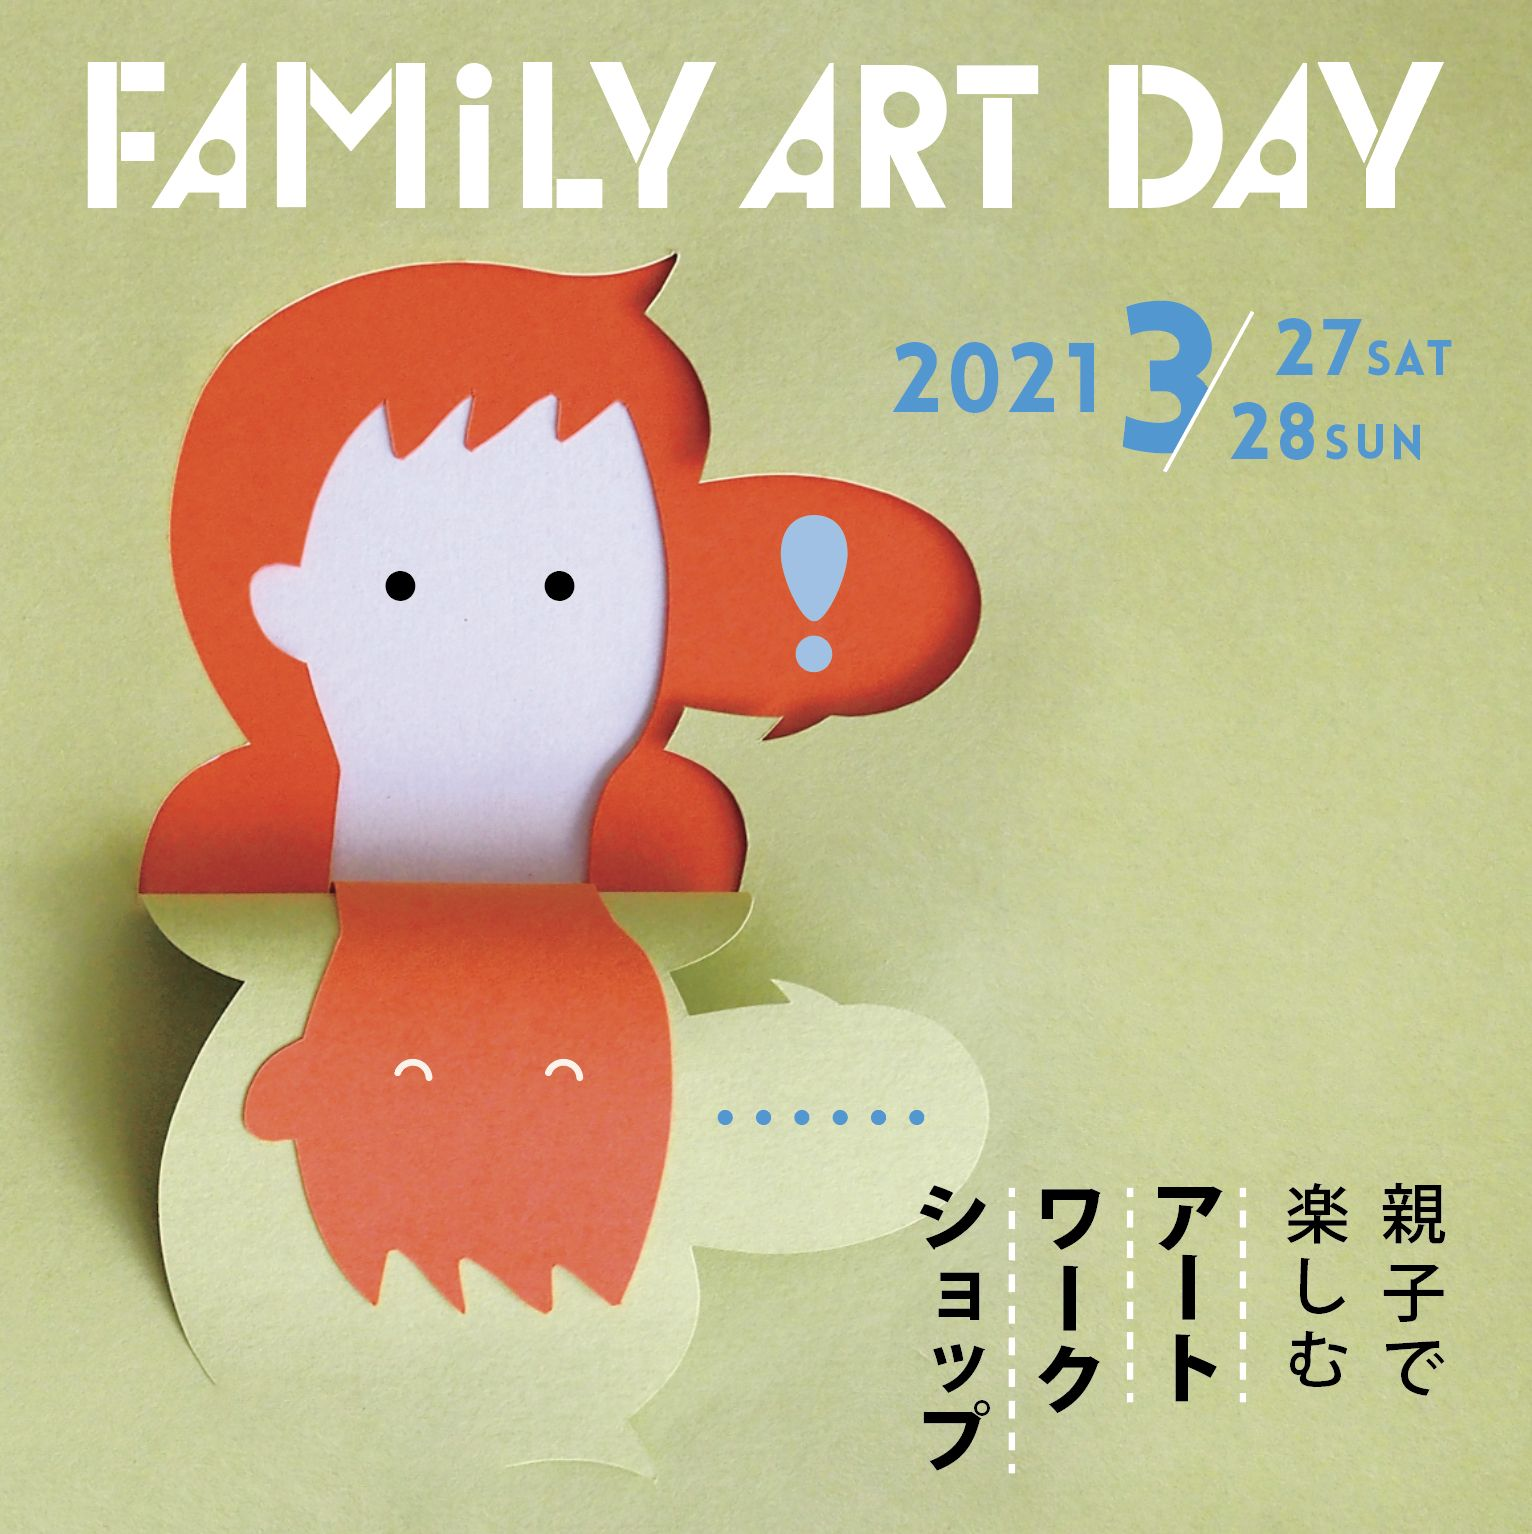 Family Art Day2021 イメージ画像